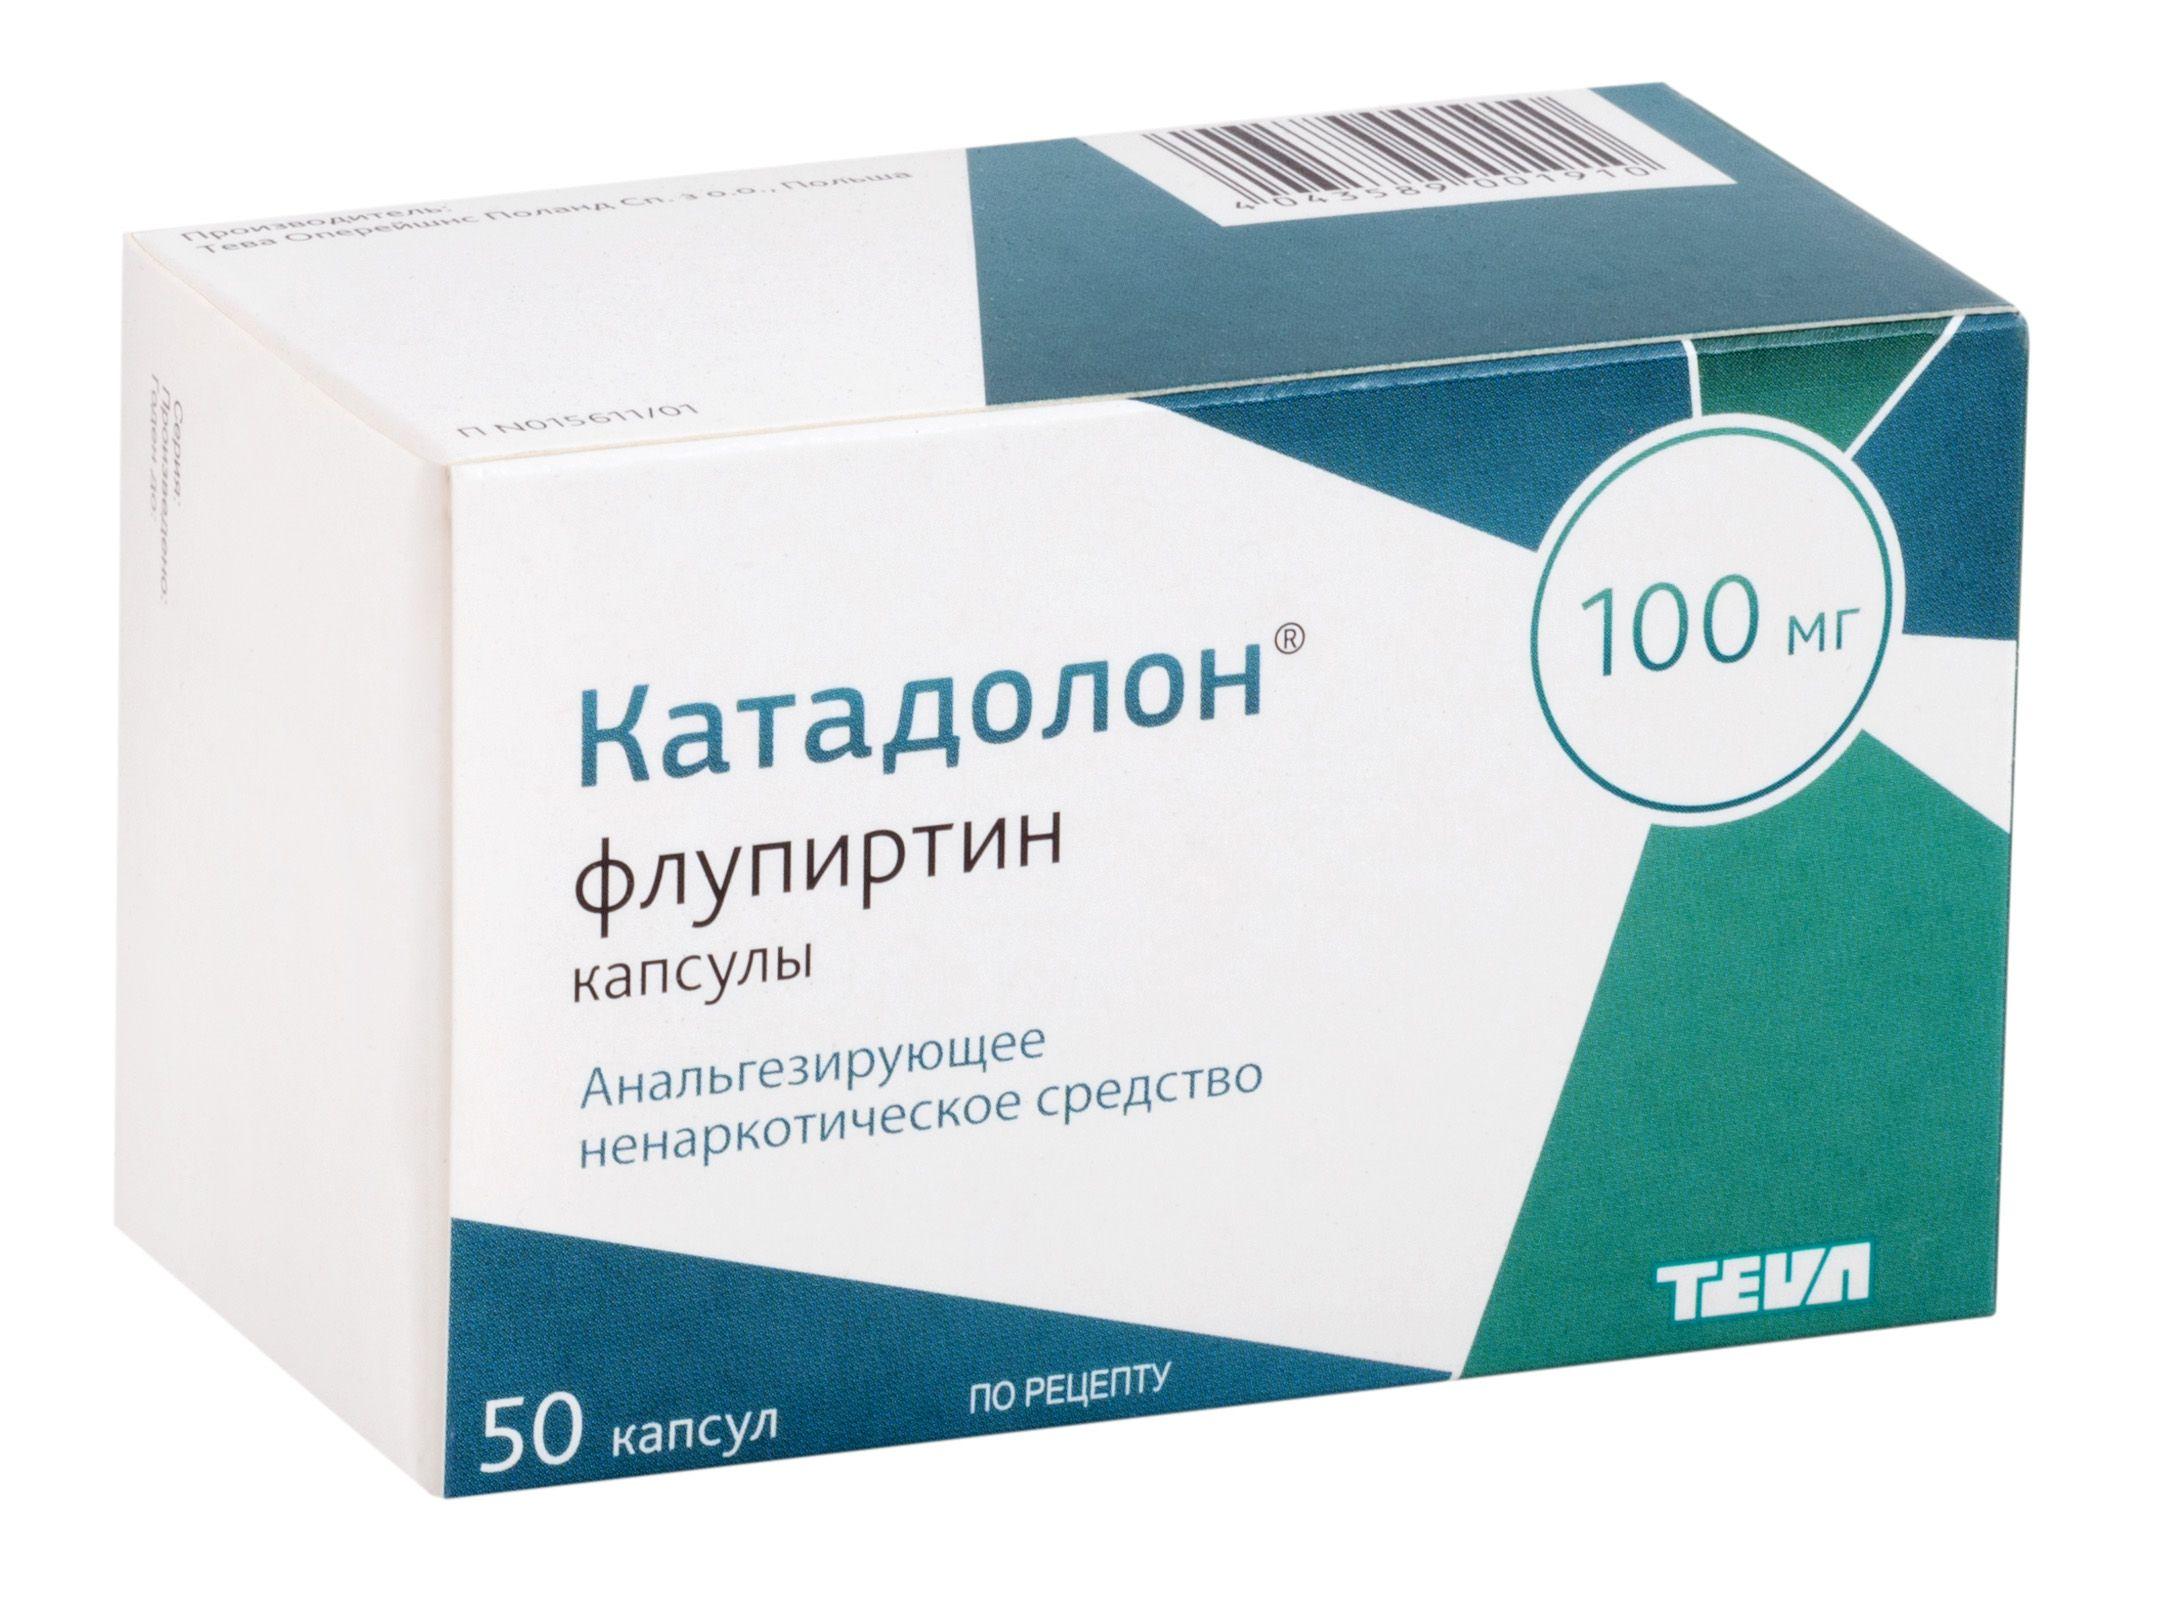 Флупиртин: препарат нового класса